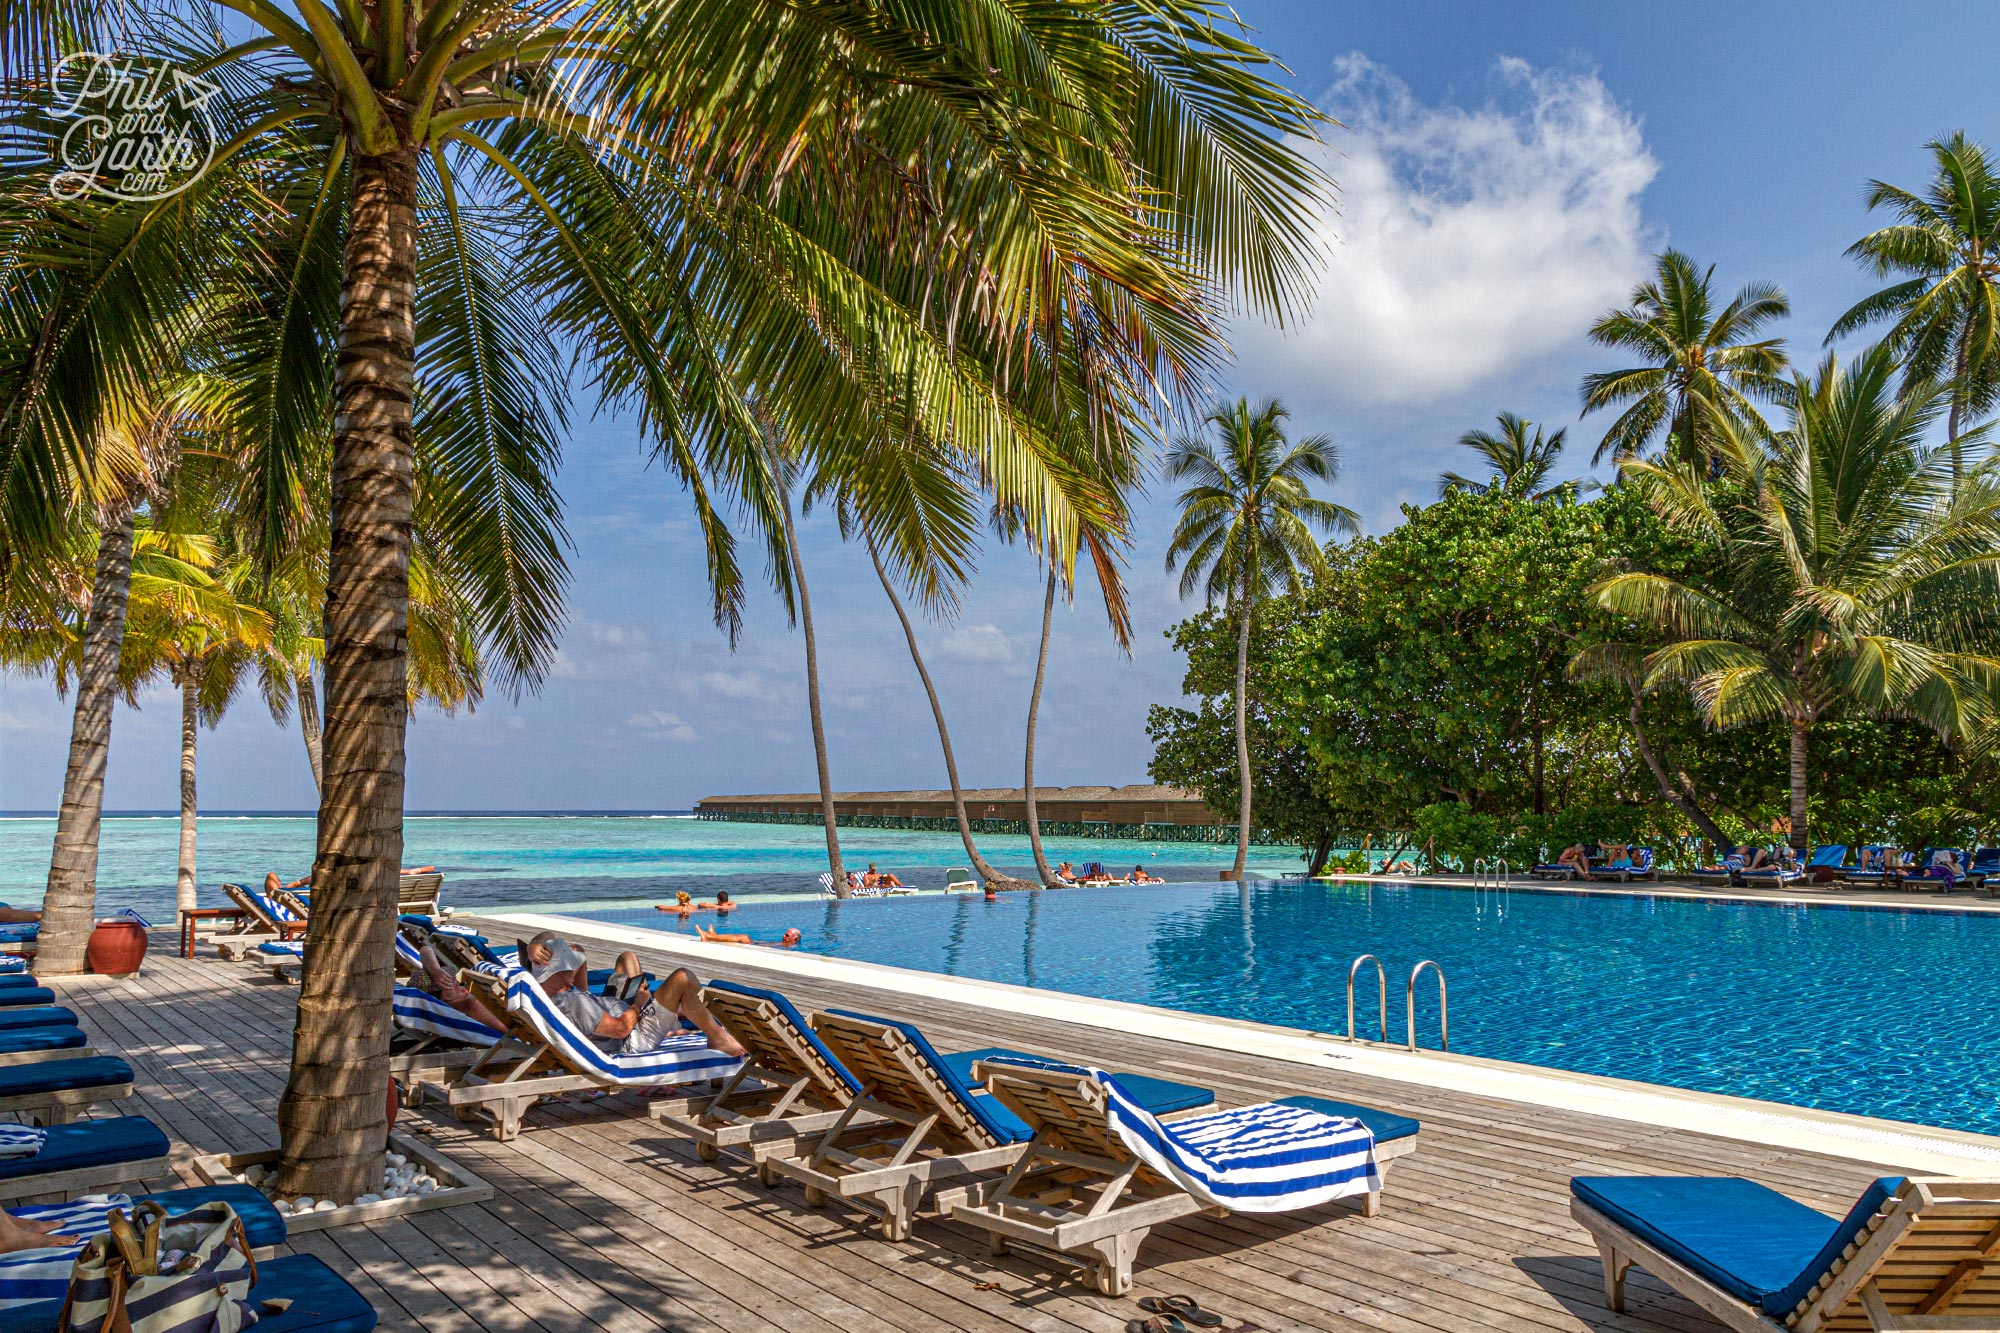 The Pavilion fresh water swimming pool